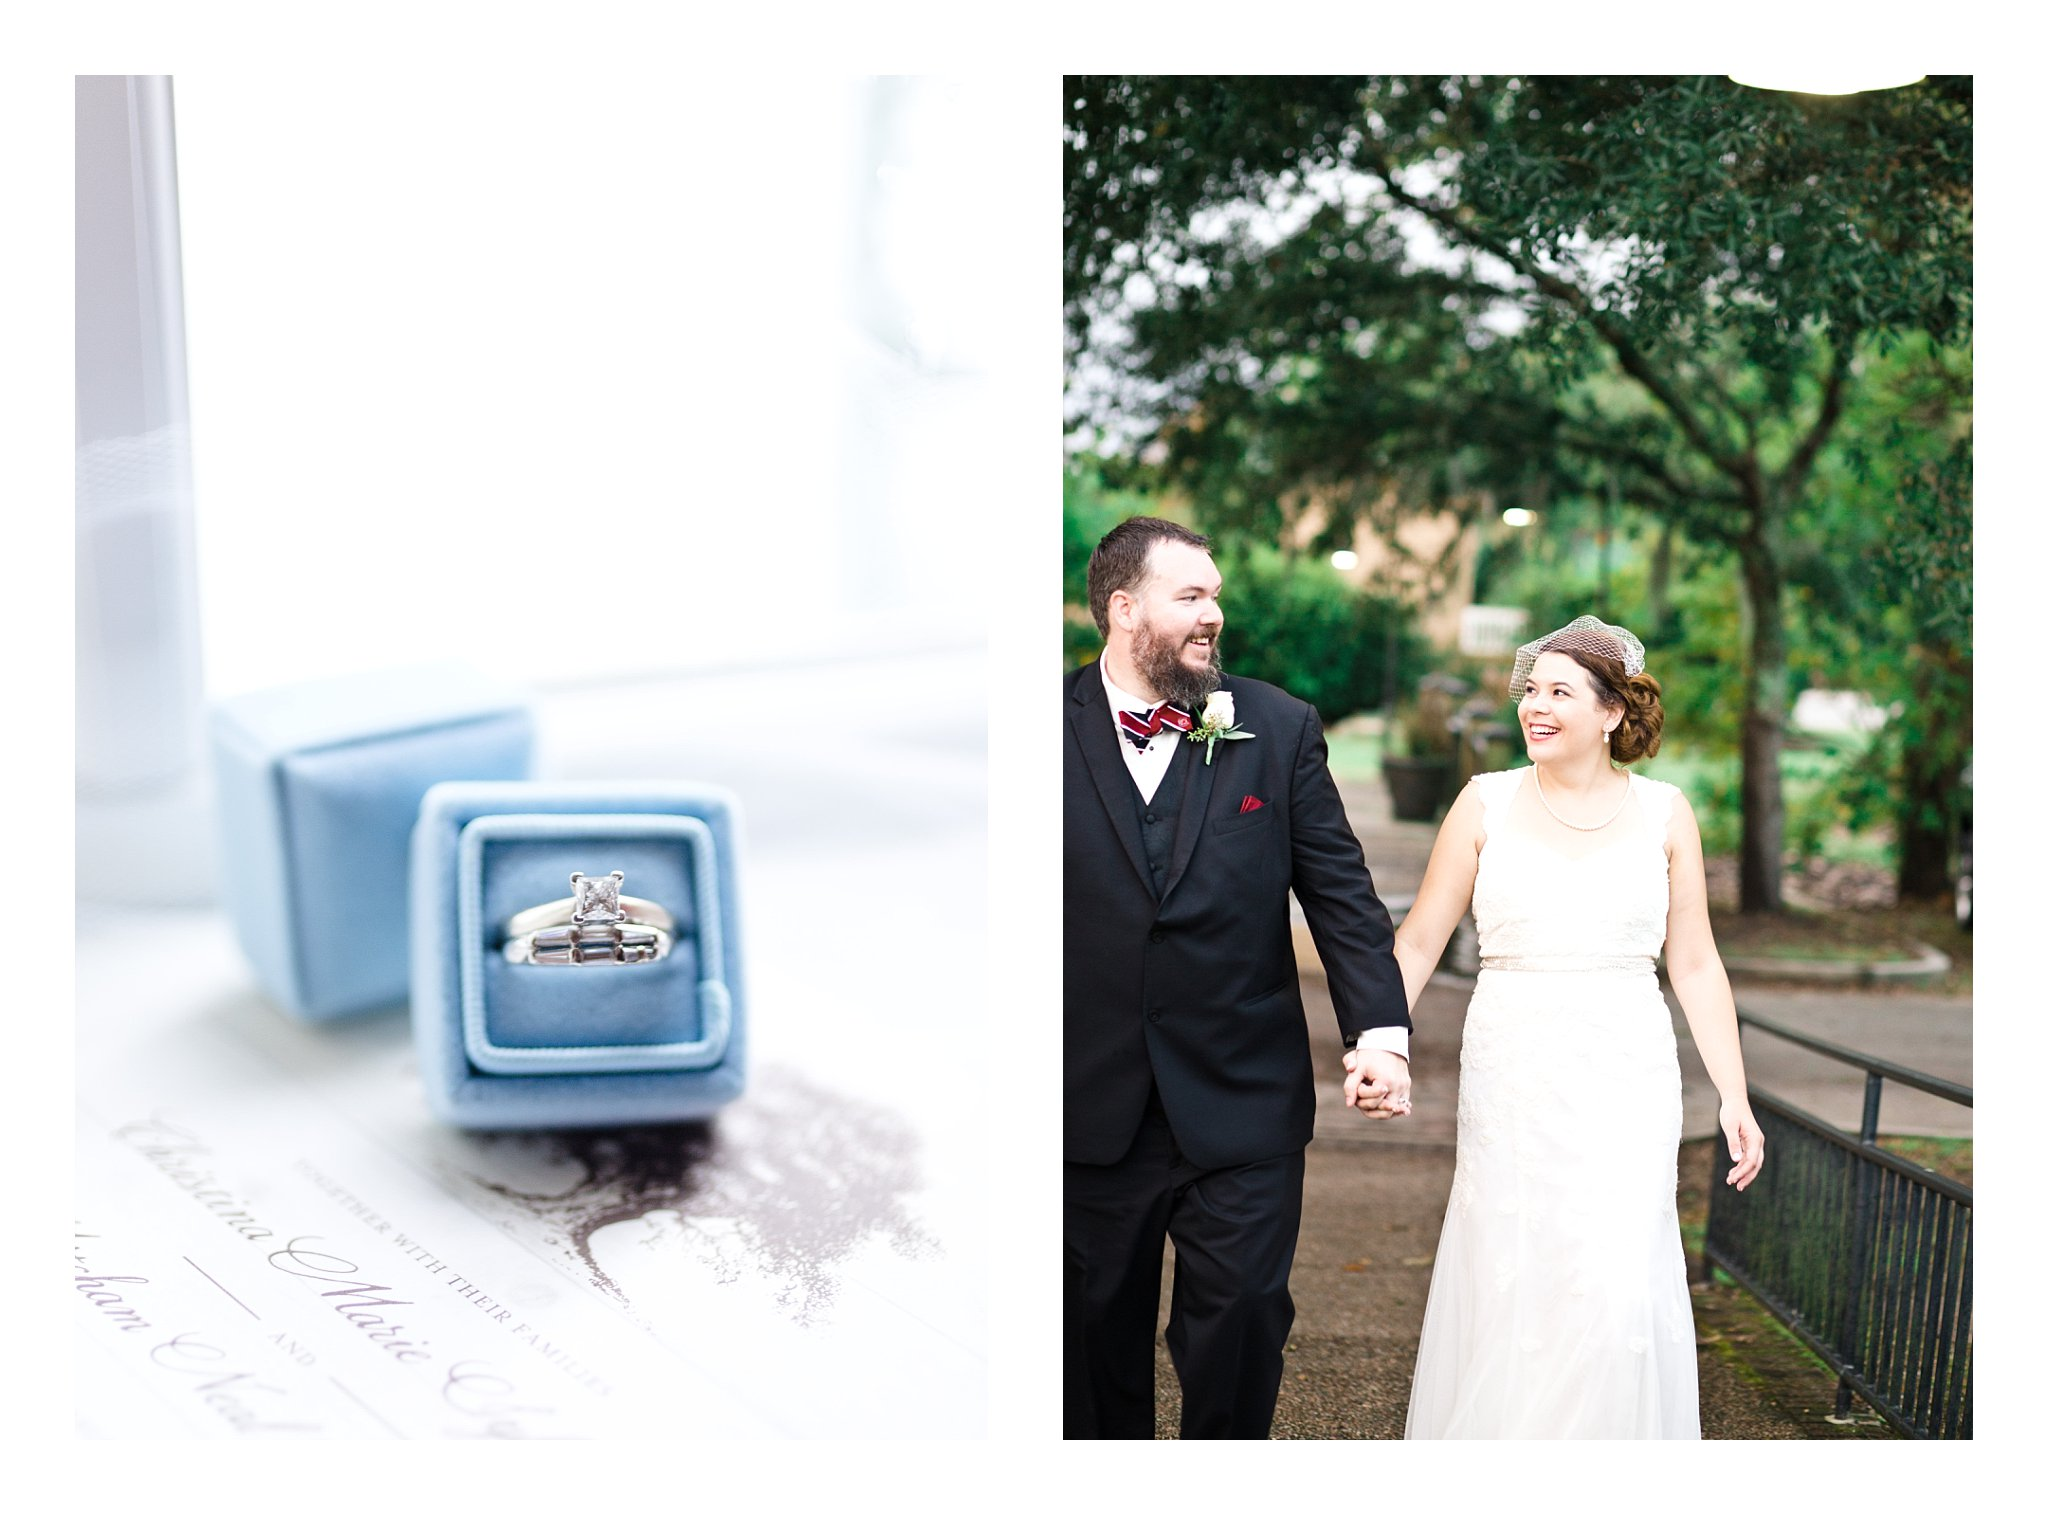 cypress-inn-garnet-black-lowcountry-vintage-wedding-conway-sc-photos_0157.jpg